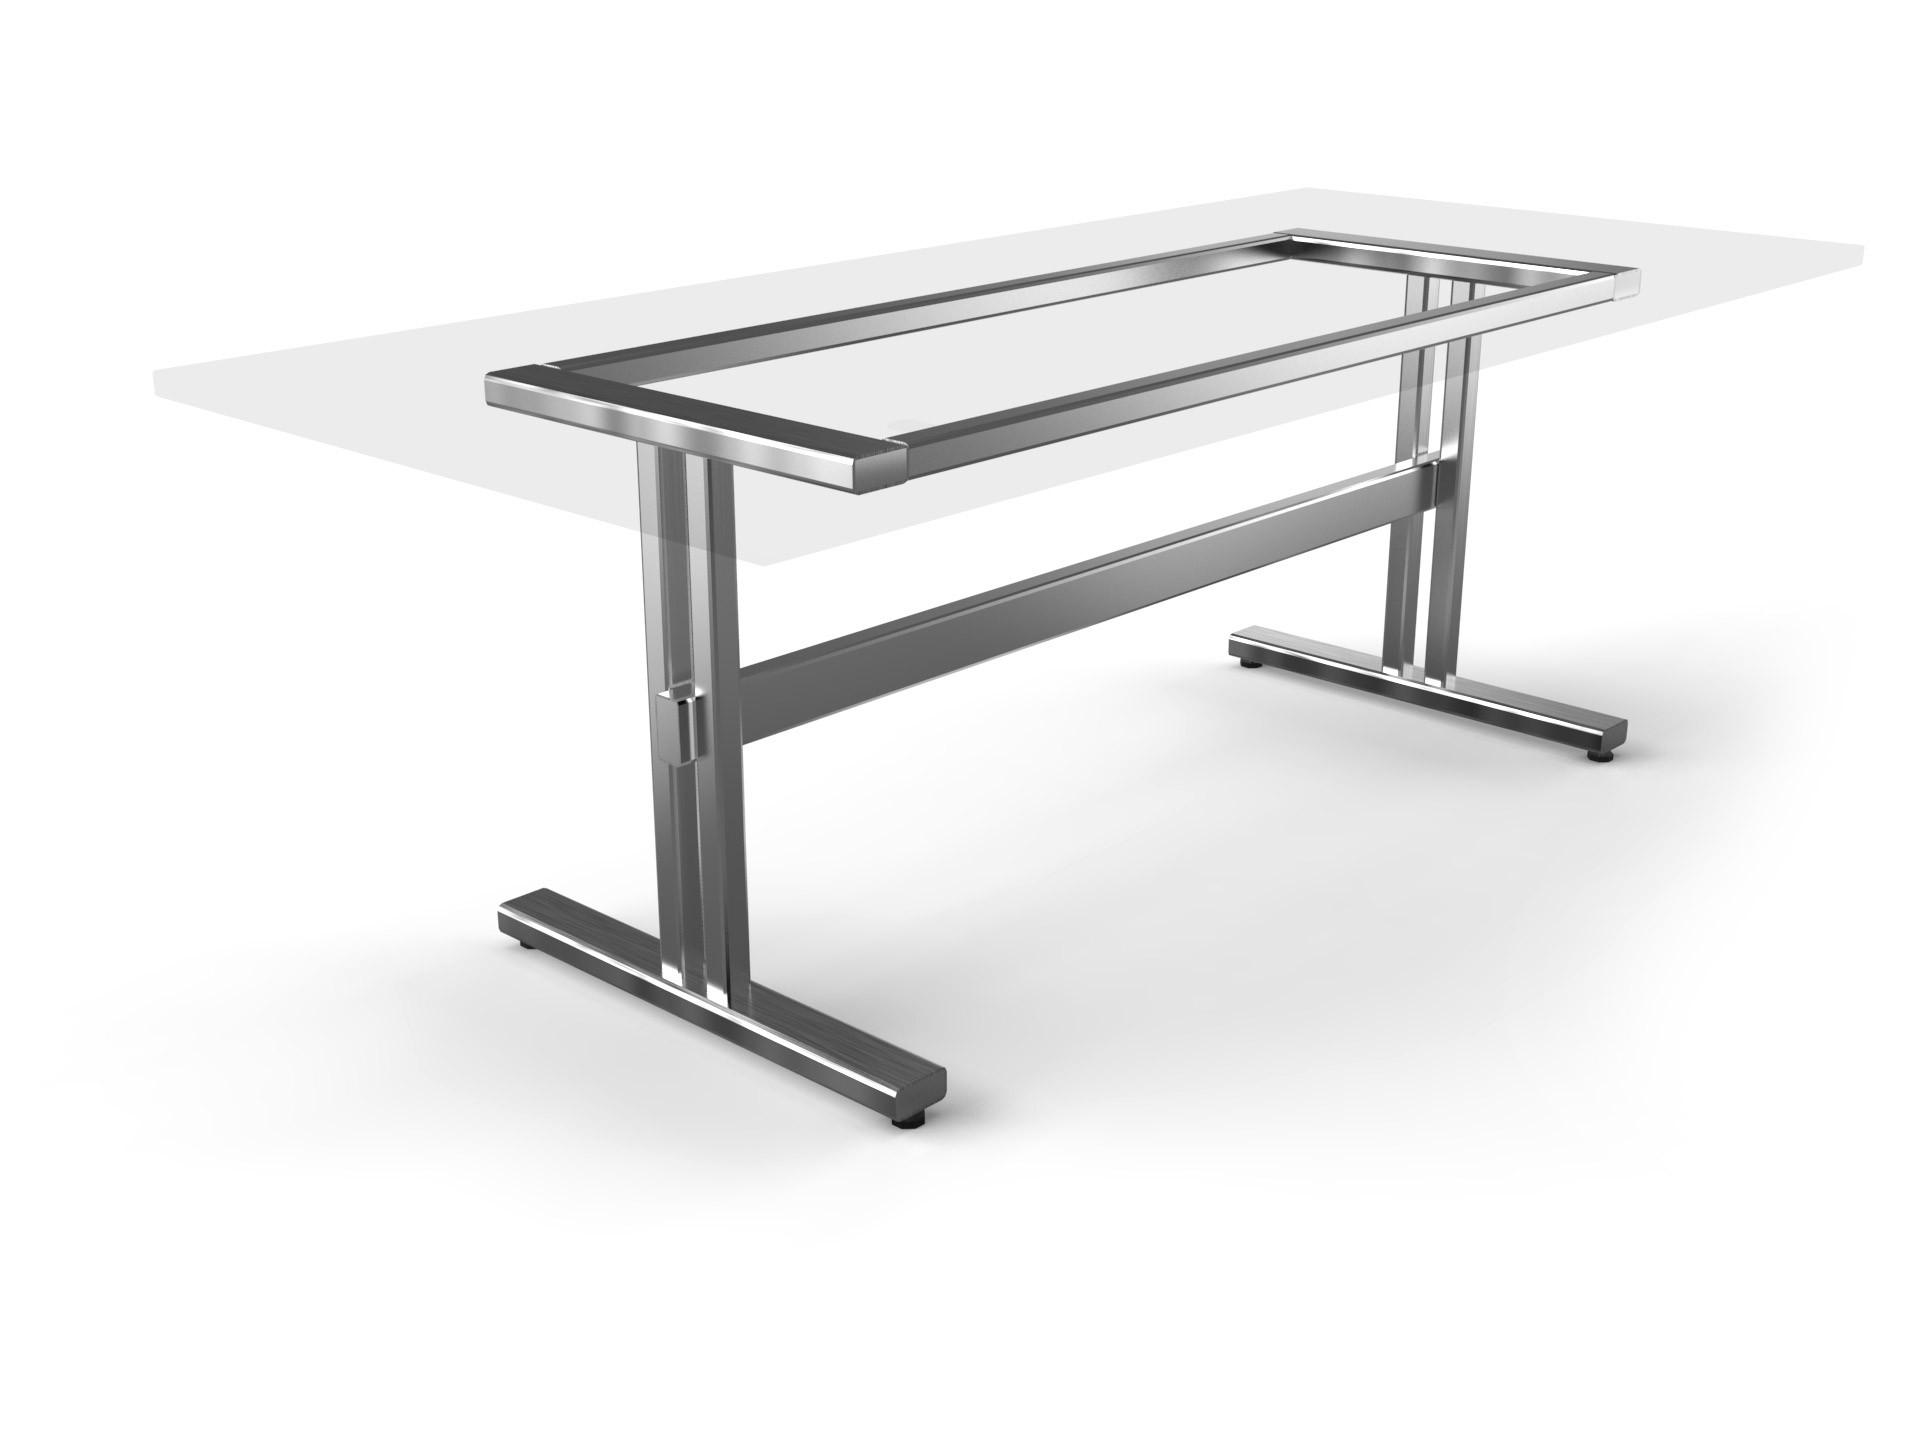 Tischgestell Trento Edelstahl